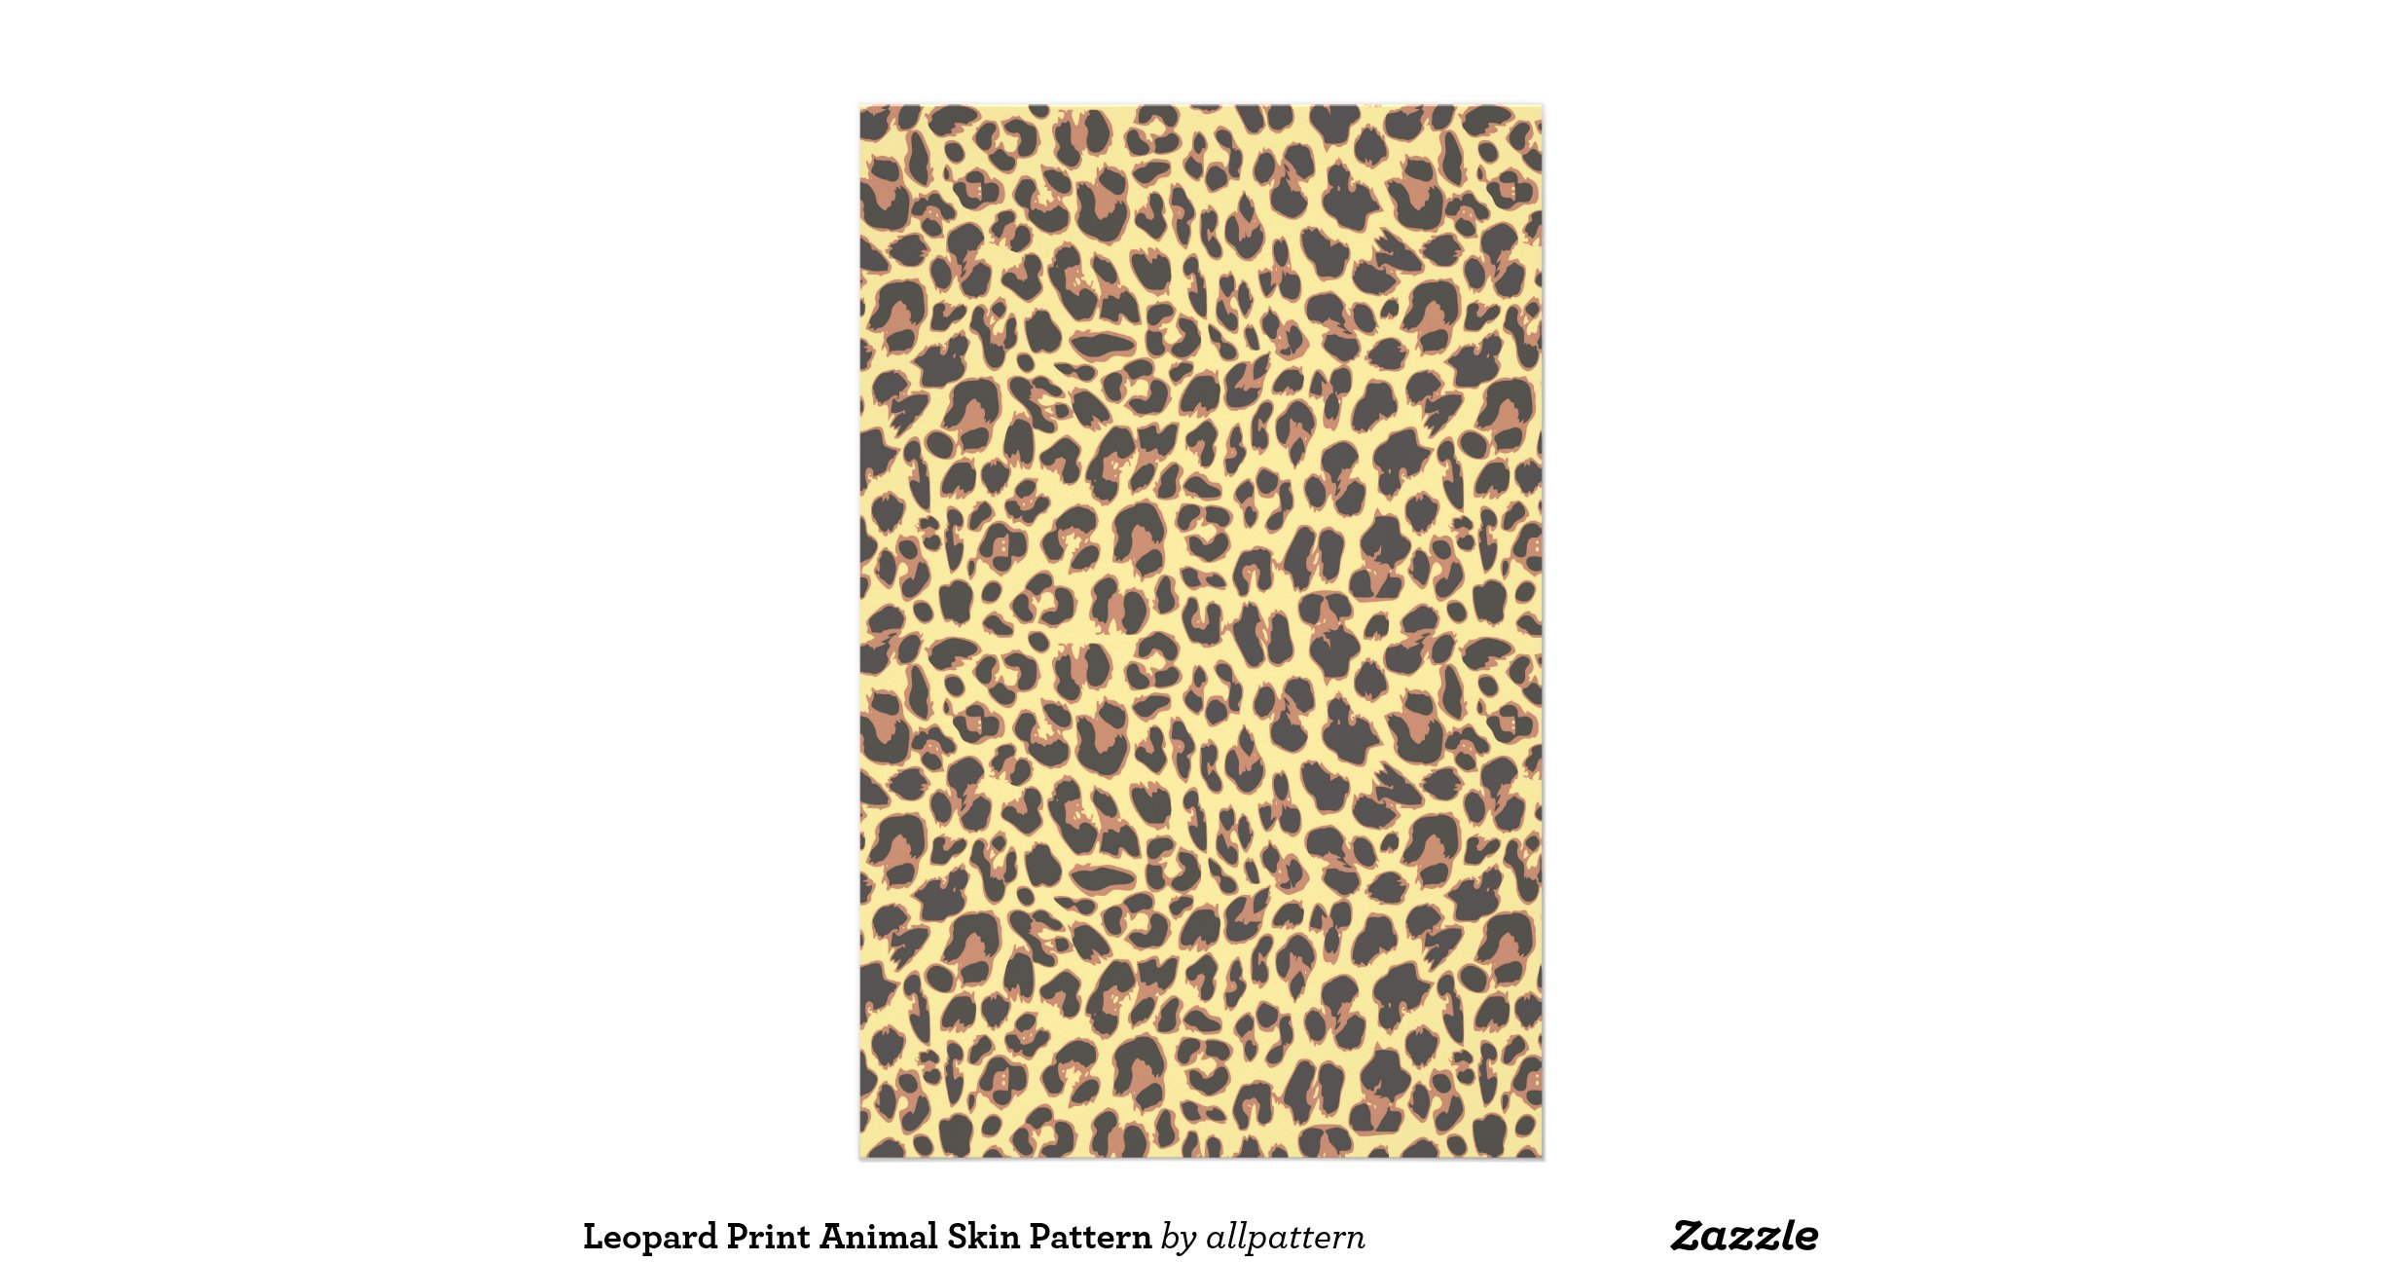 leopard pattern 2 print - photo #18